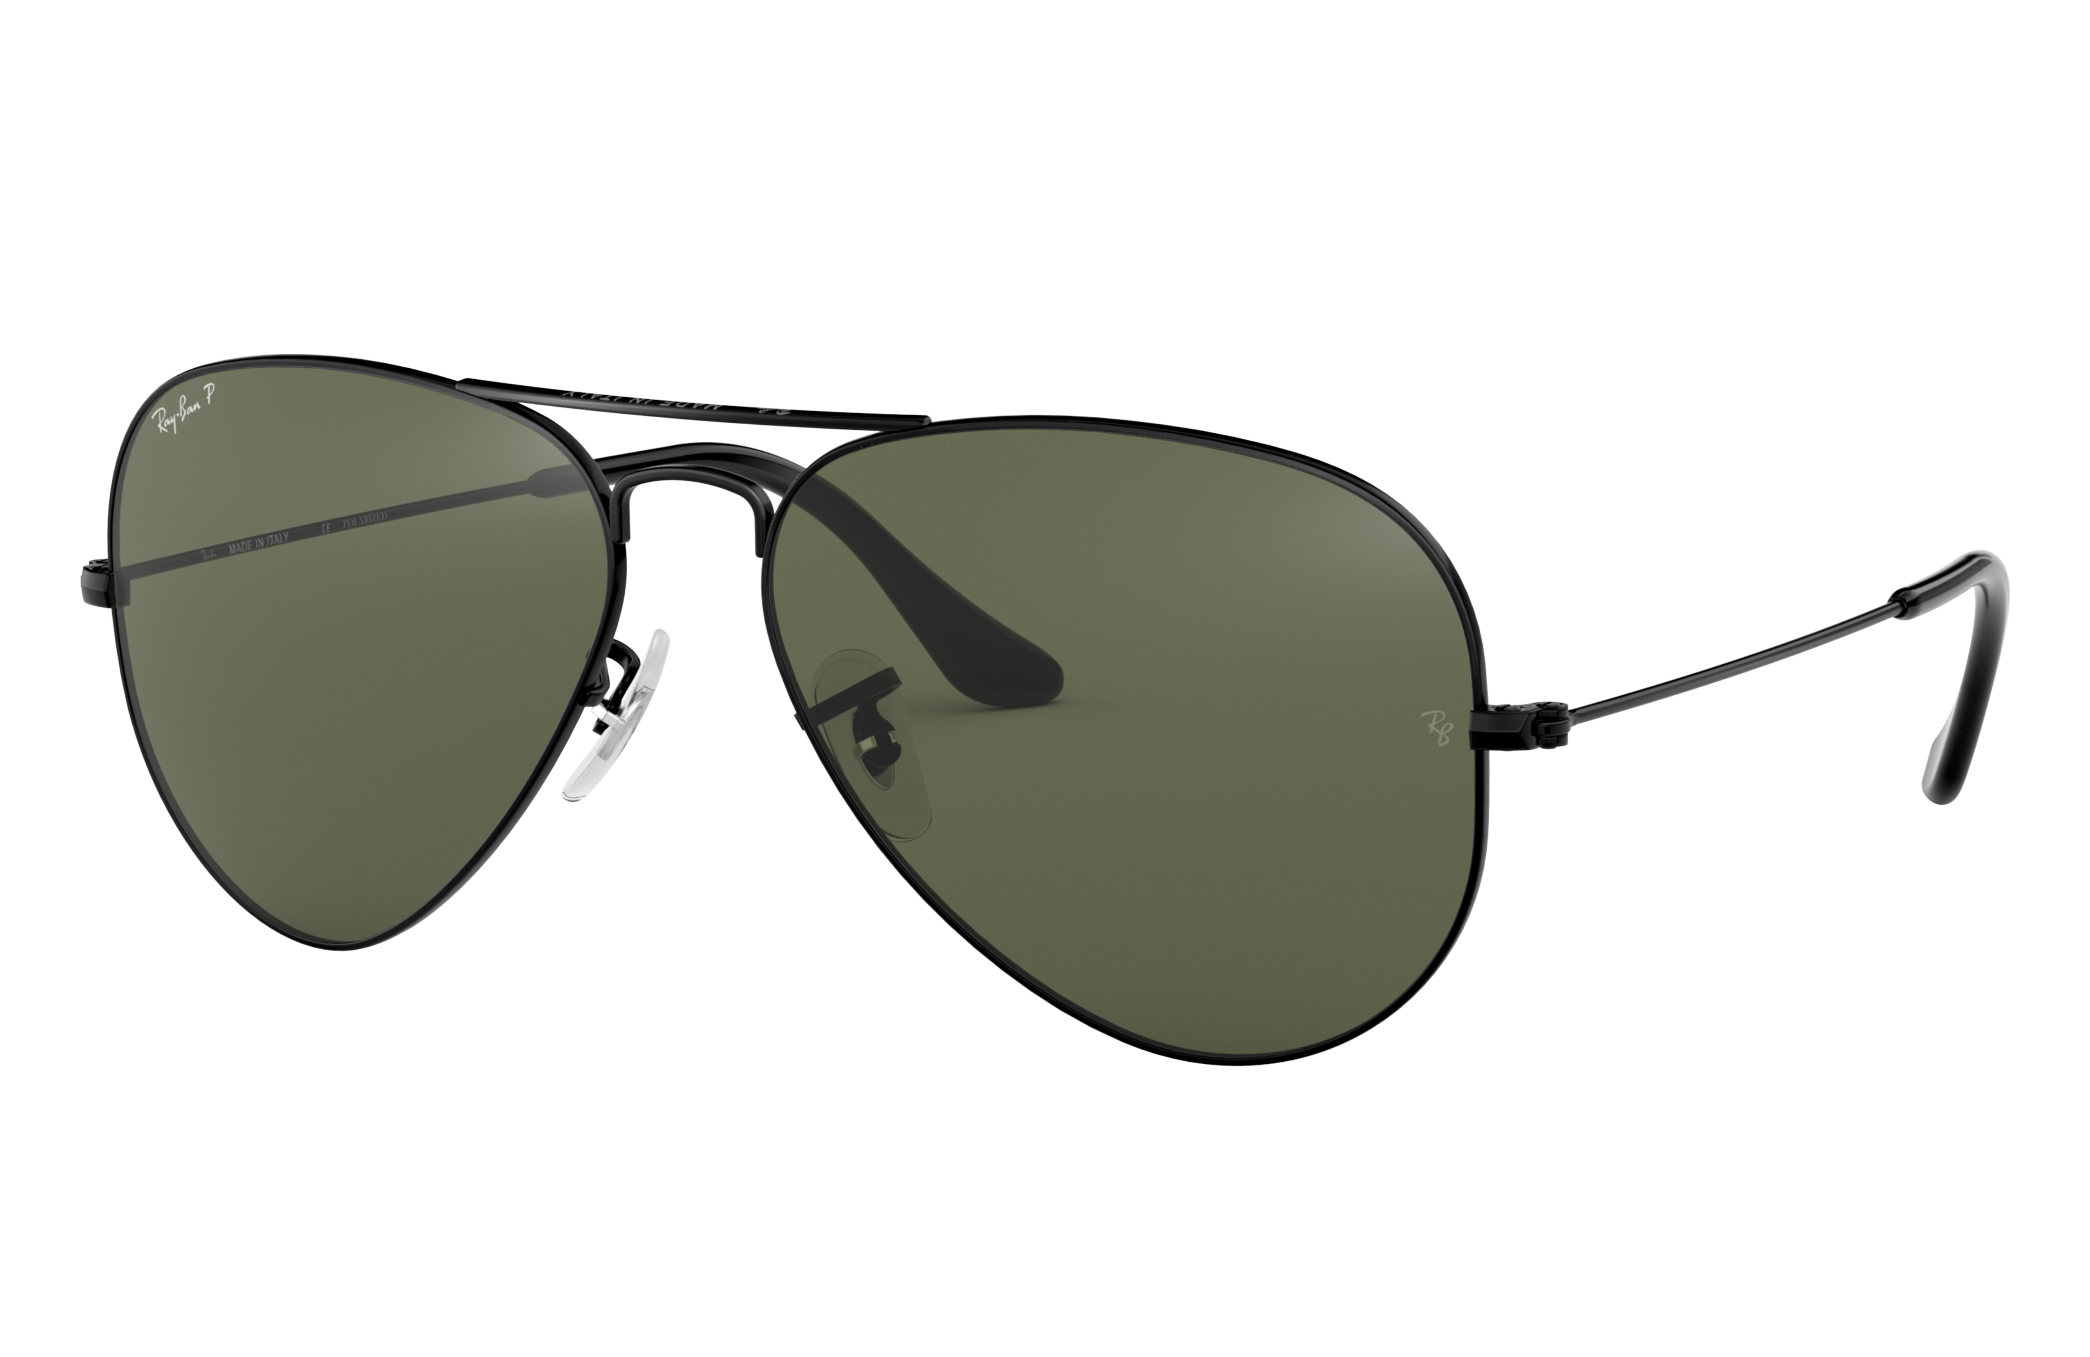 Ray-Ban Aviator Classic Black, Polarized Green Lenses - RB3025